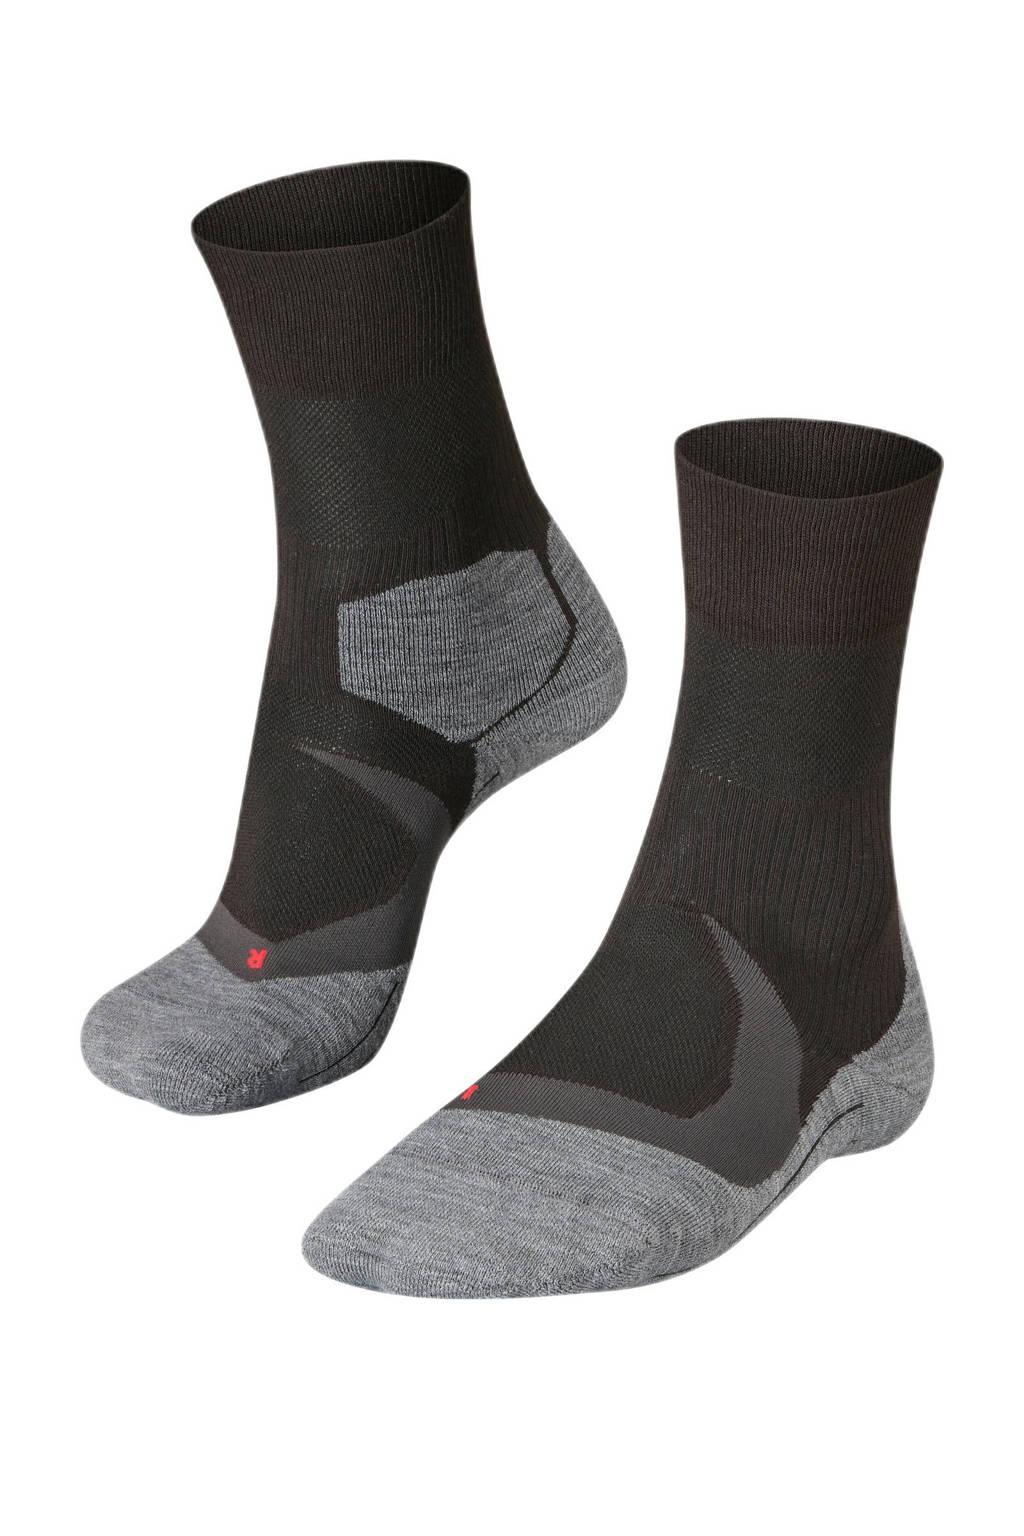 Falke Sport   RU4 Cool hardloopsokken zwart, Zwart/grijs